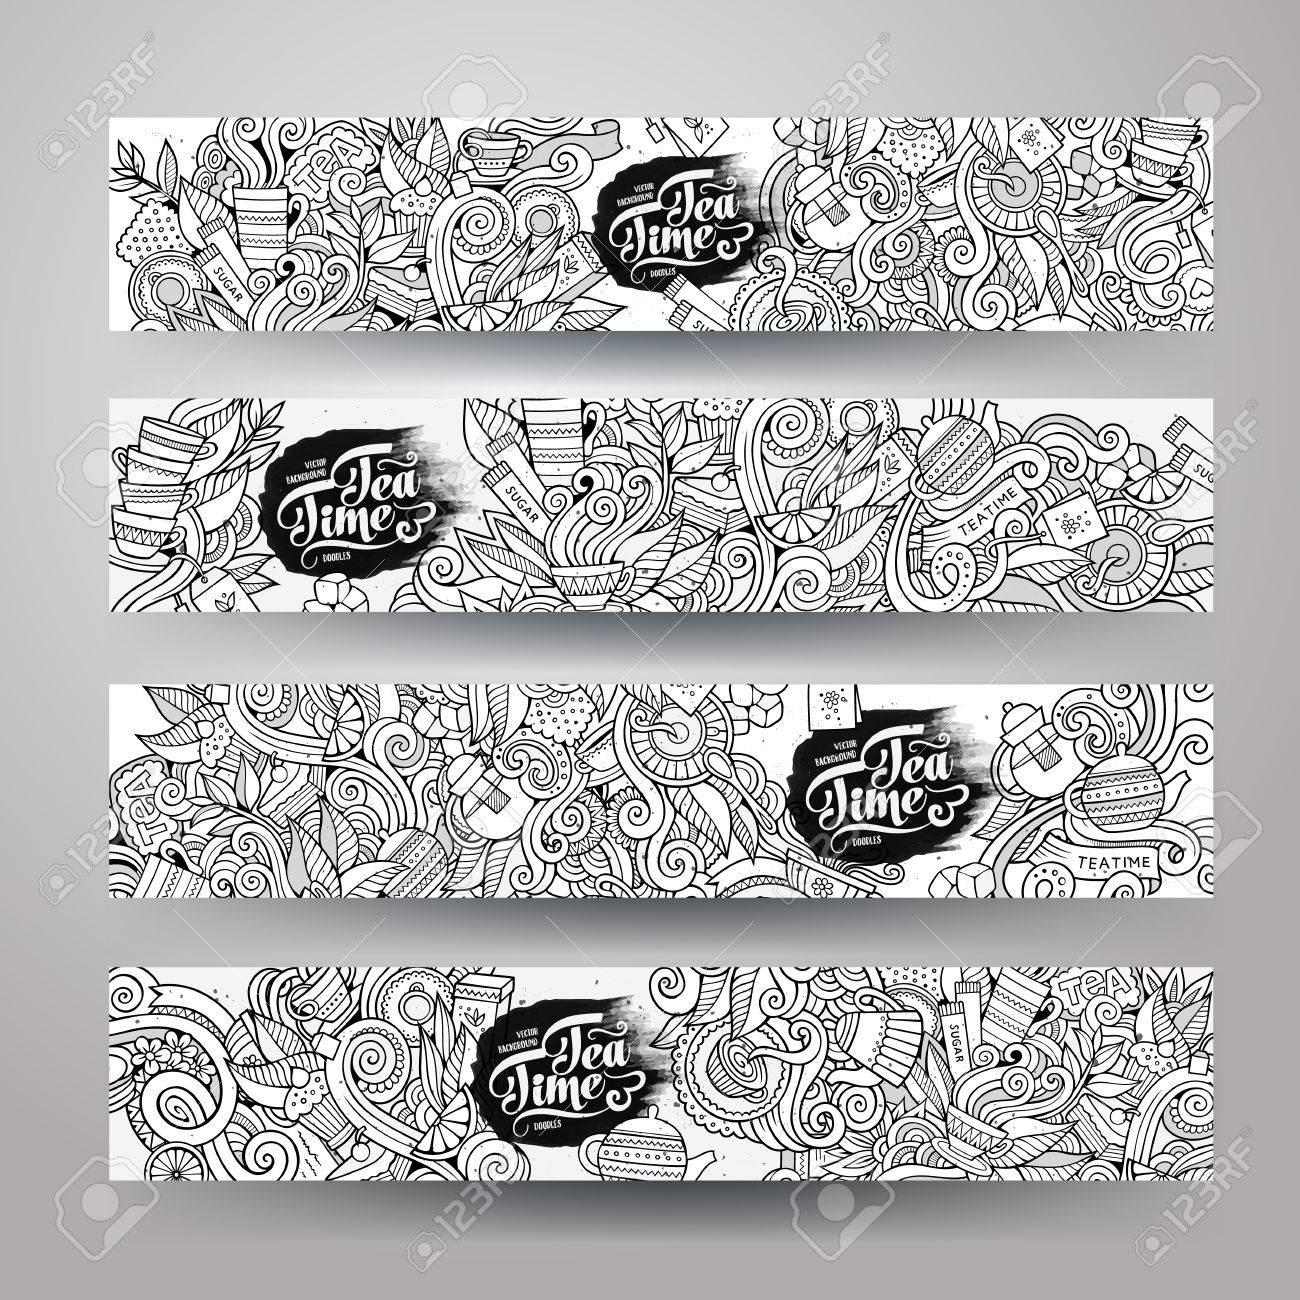 hand drawn sketchy doodles tea design banner templates set - 43497014